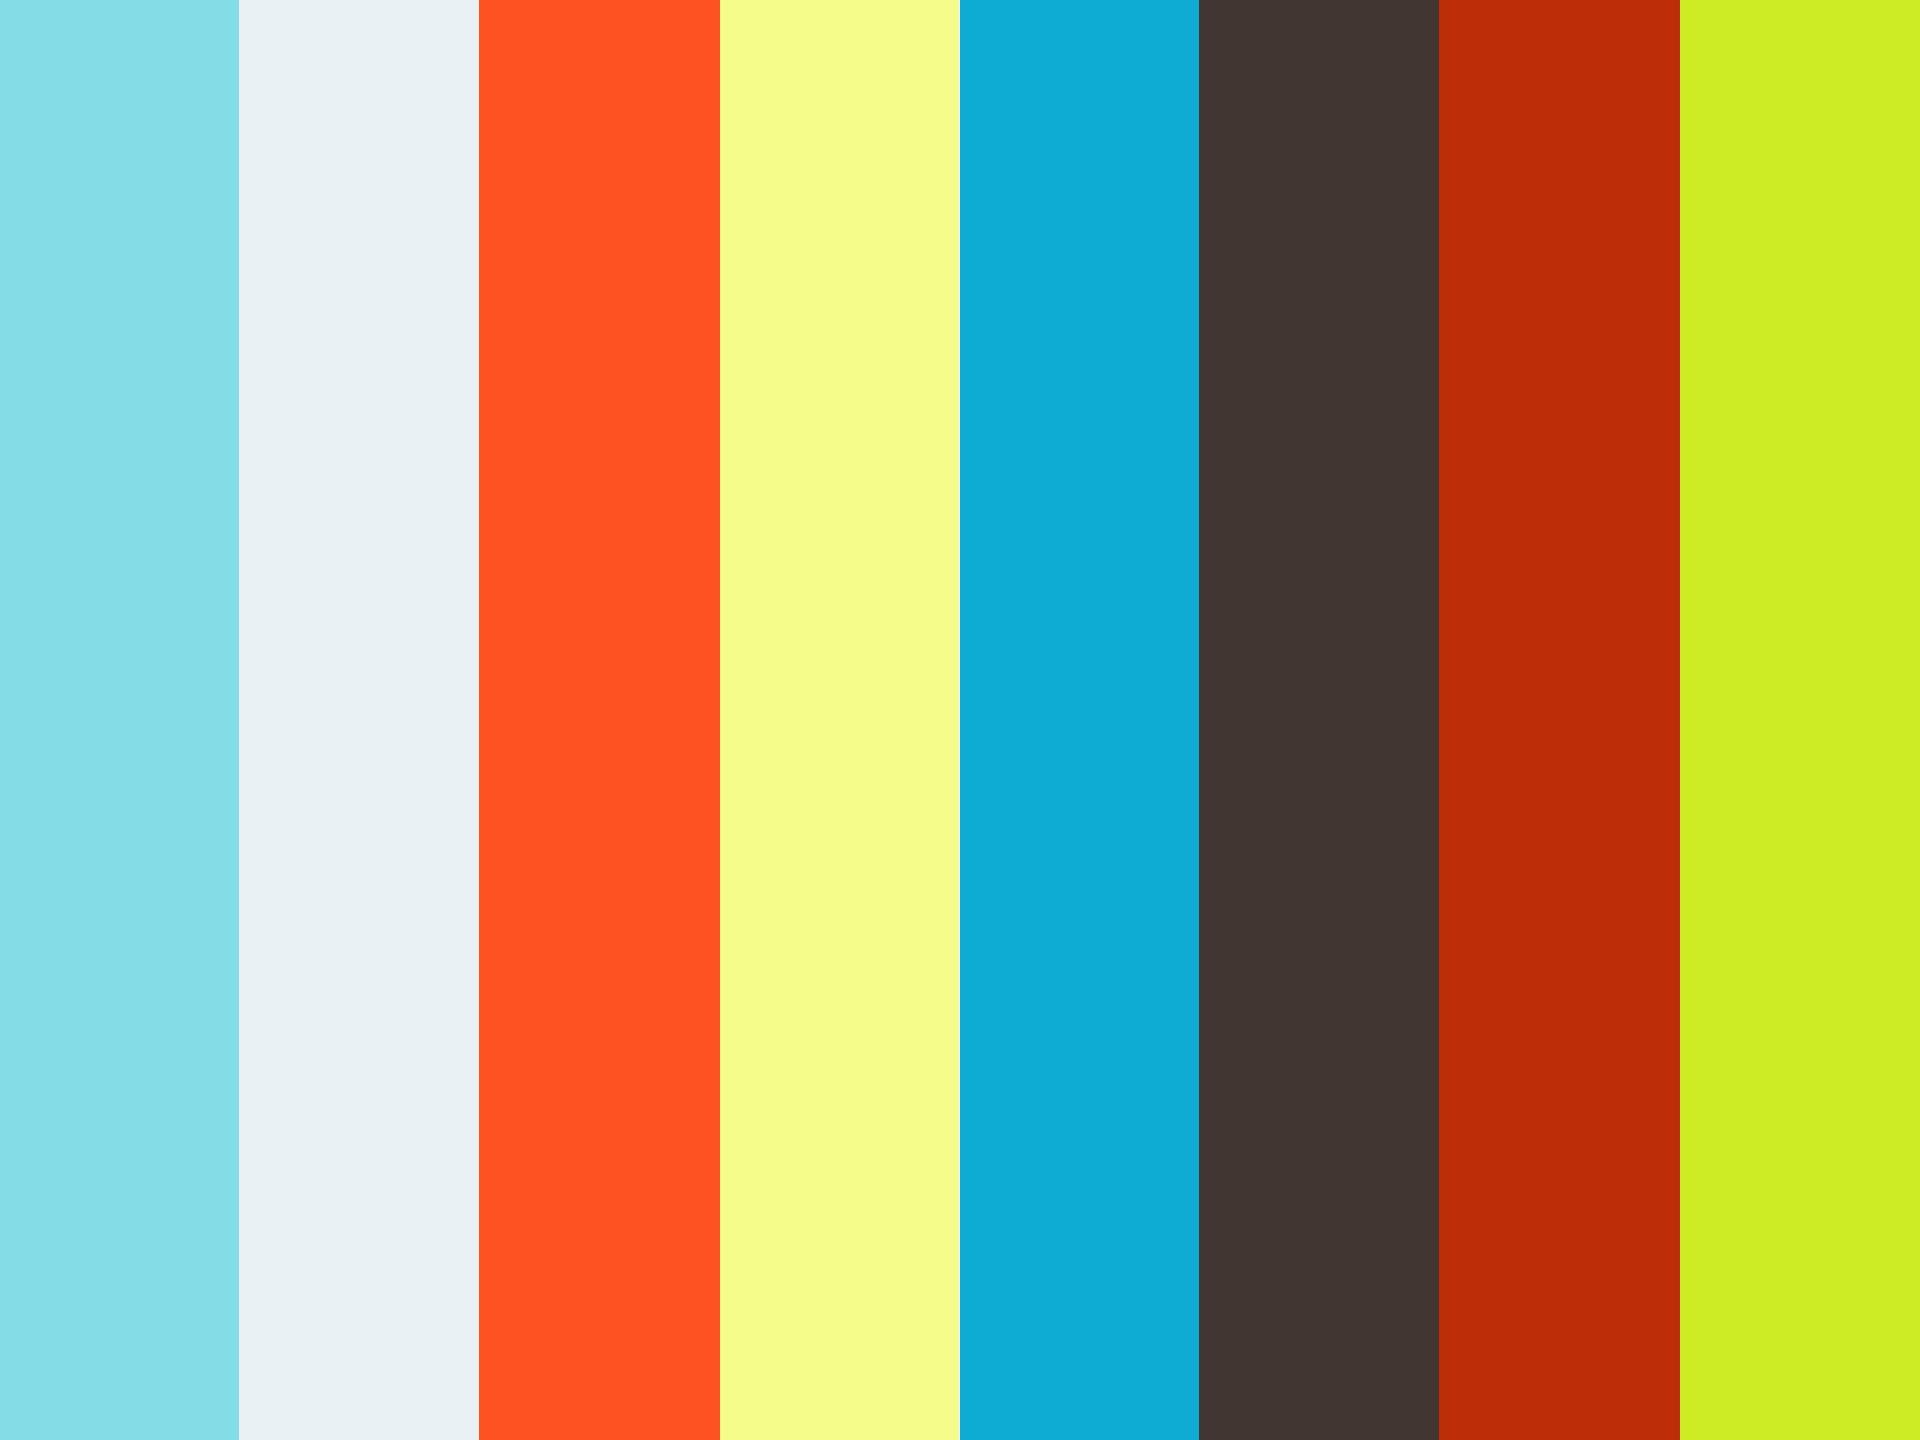 【Nex】柳沢哲秀先生: 根管内の機械的な拡大 #1